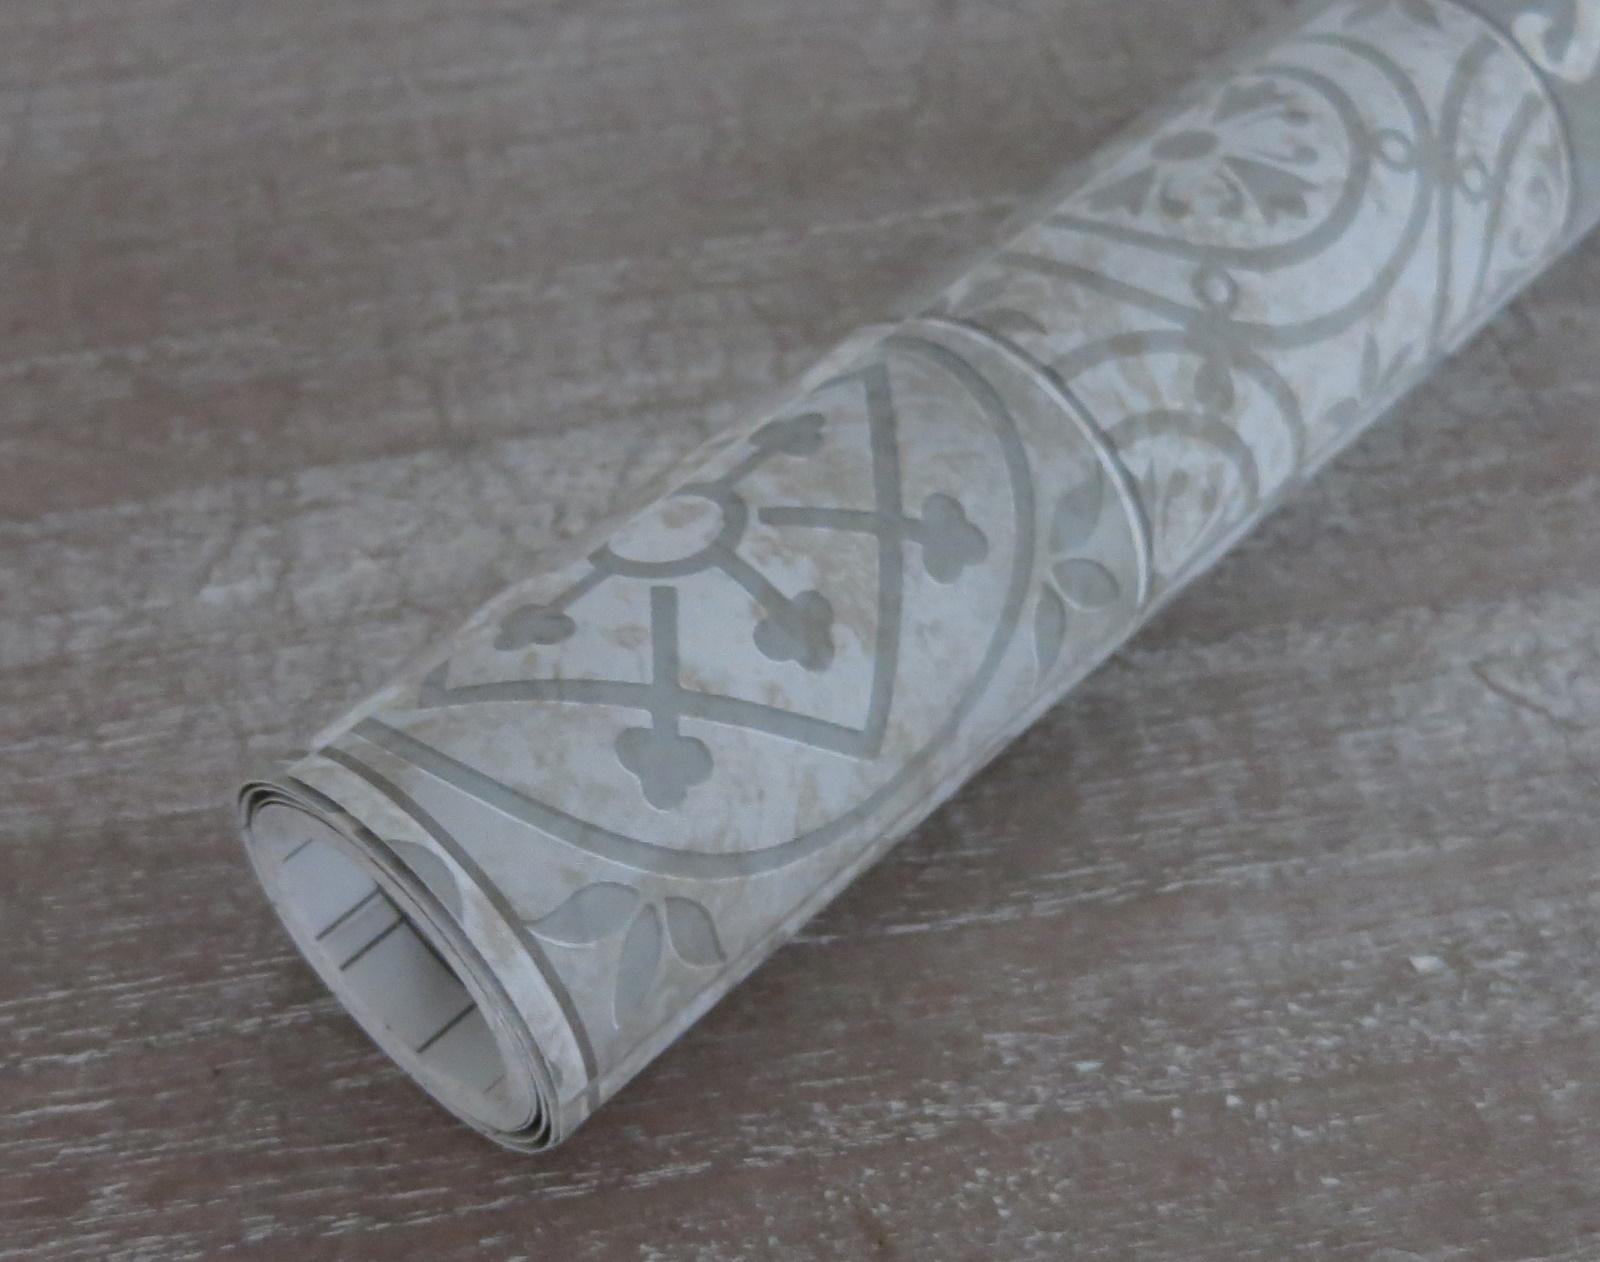 Klebefolie Möbelfolie Carrara Marmor Look rot rose Dekorfolie 45 cm x 200 cm